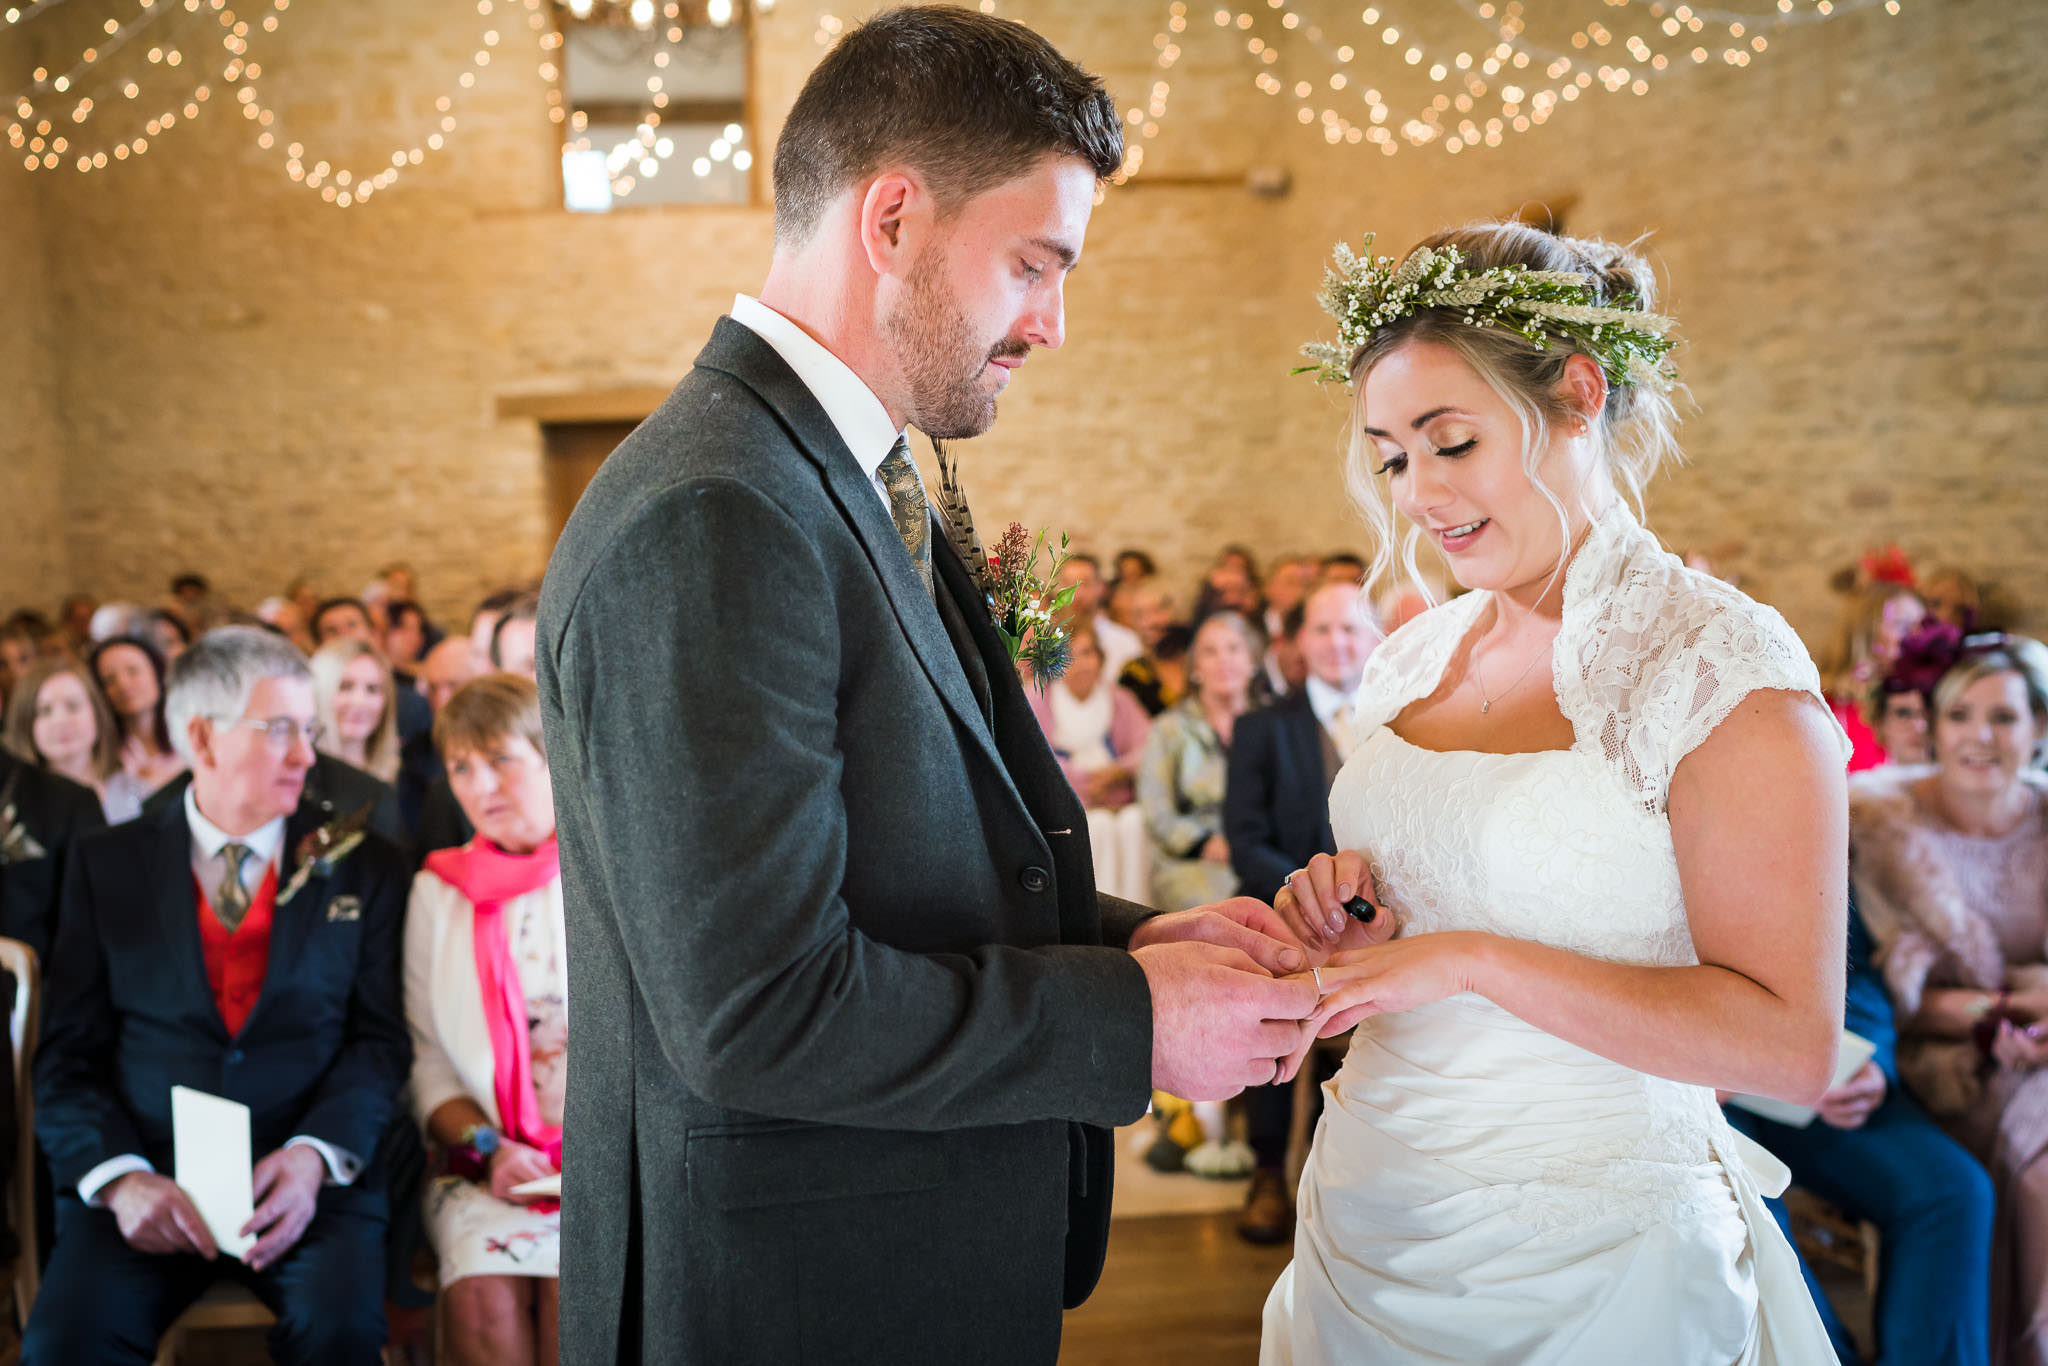 NC-2018-10-07_alex-and-nick-wedding-2173.jpg